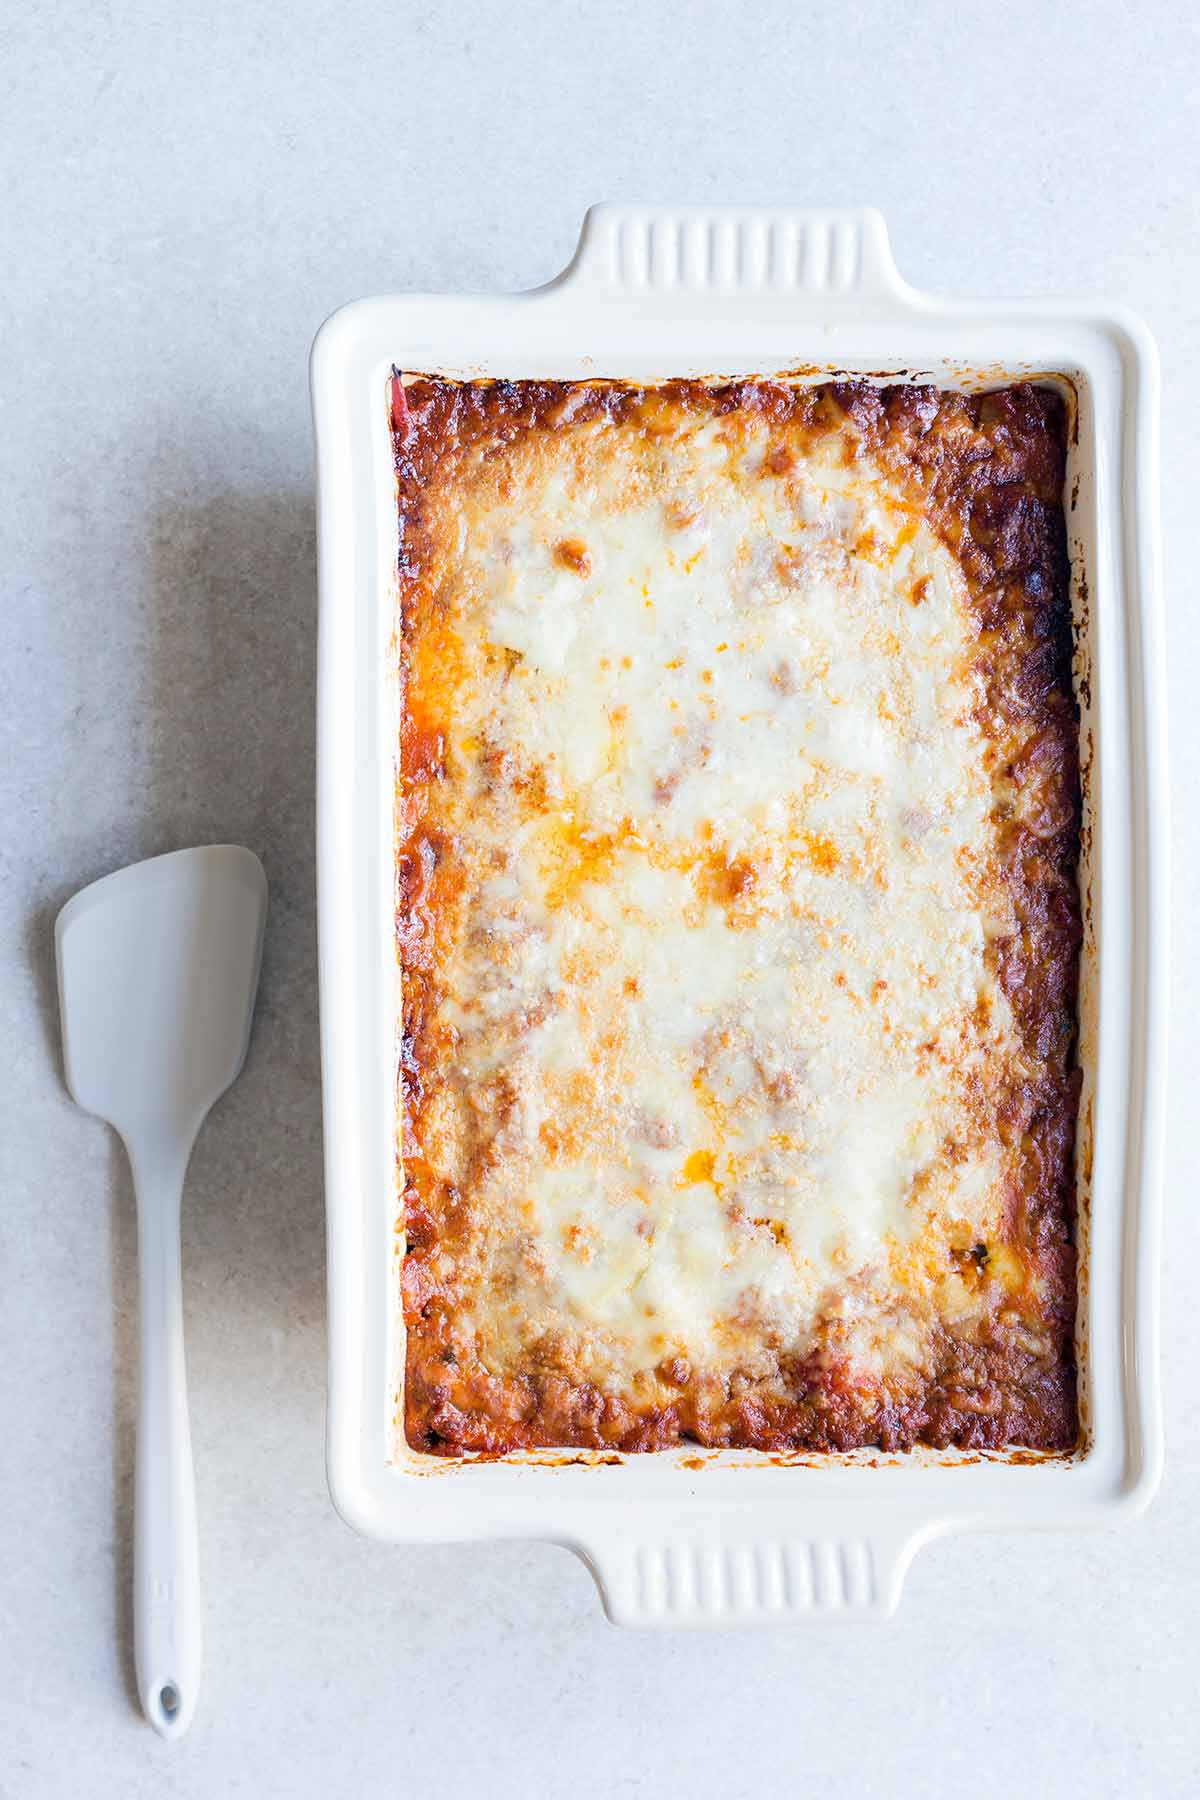 A photo of zucchini lasagna in a casserole dish on a pale backdrop.